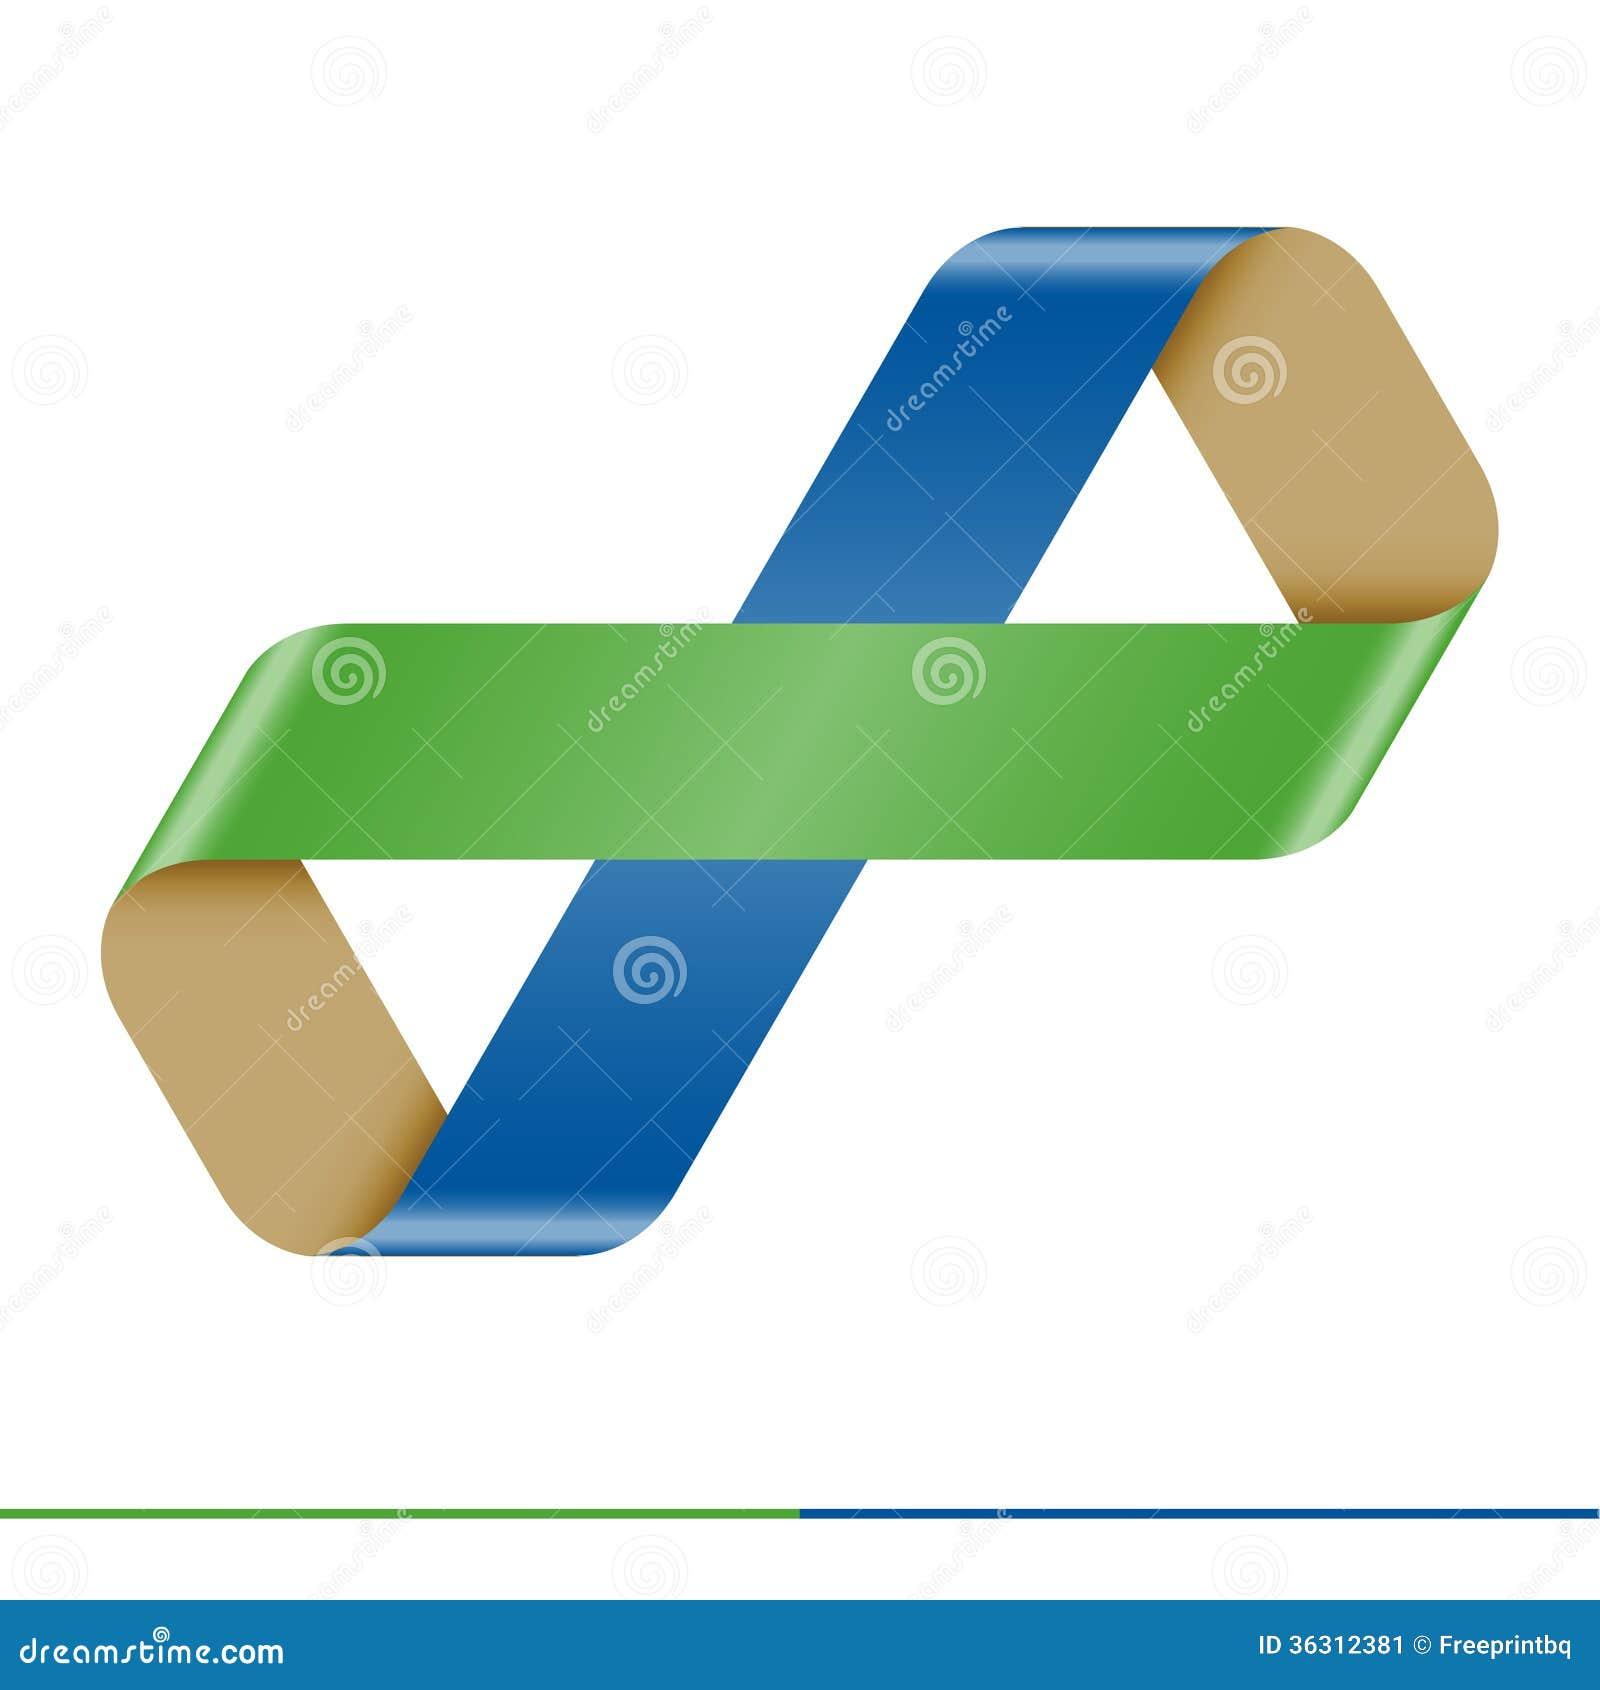 Mobius Strip Of Paper Stock Image Image 36312381